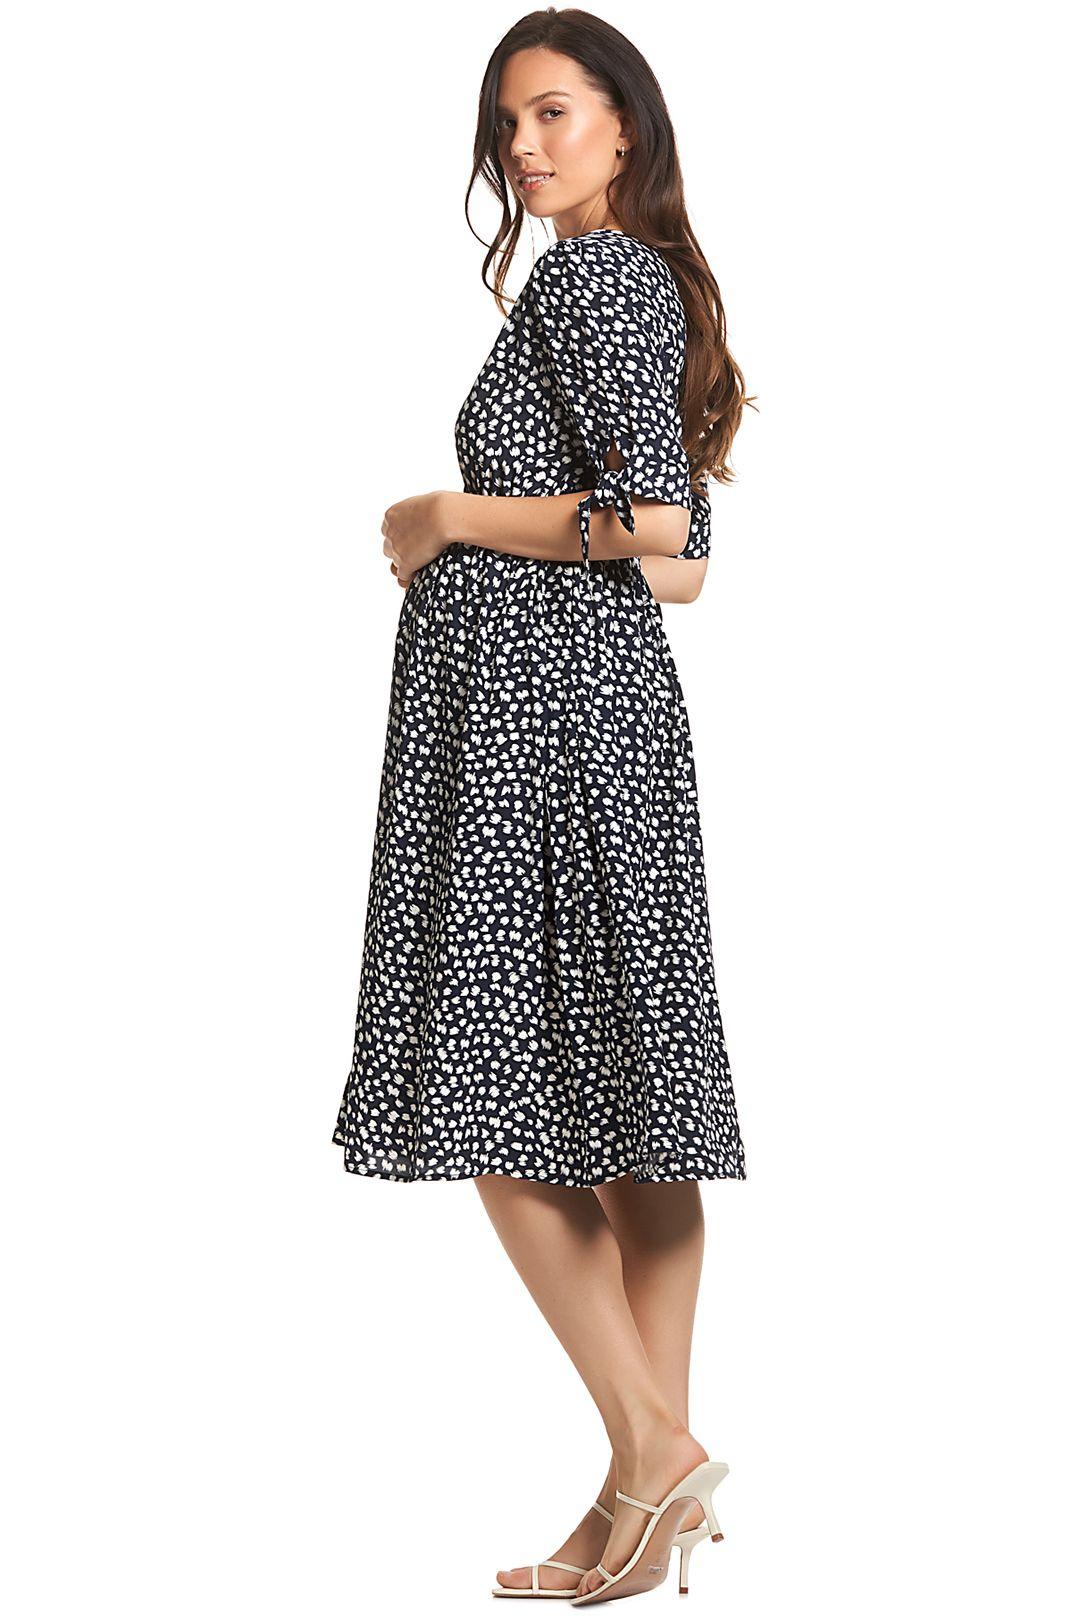 Soon-Maternity-Zippi-Dress-Navy-Speck-Side